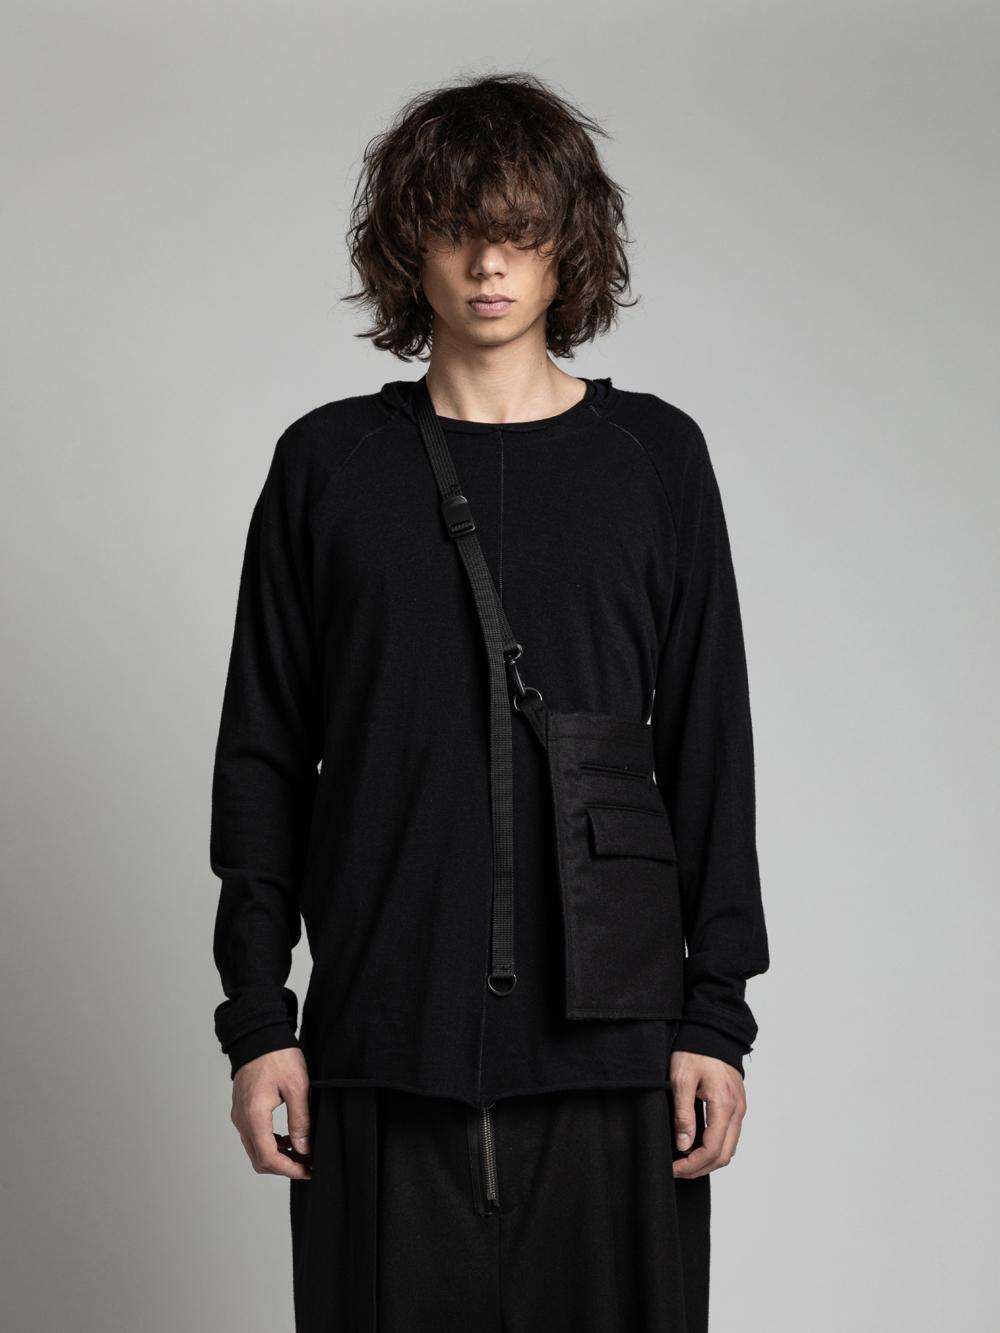 VI-3168-09 / ウール ポケット サコッシュ (小)